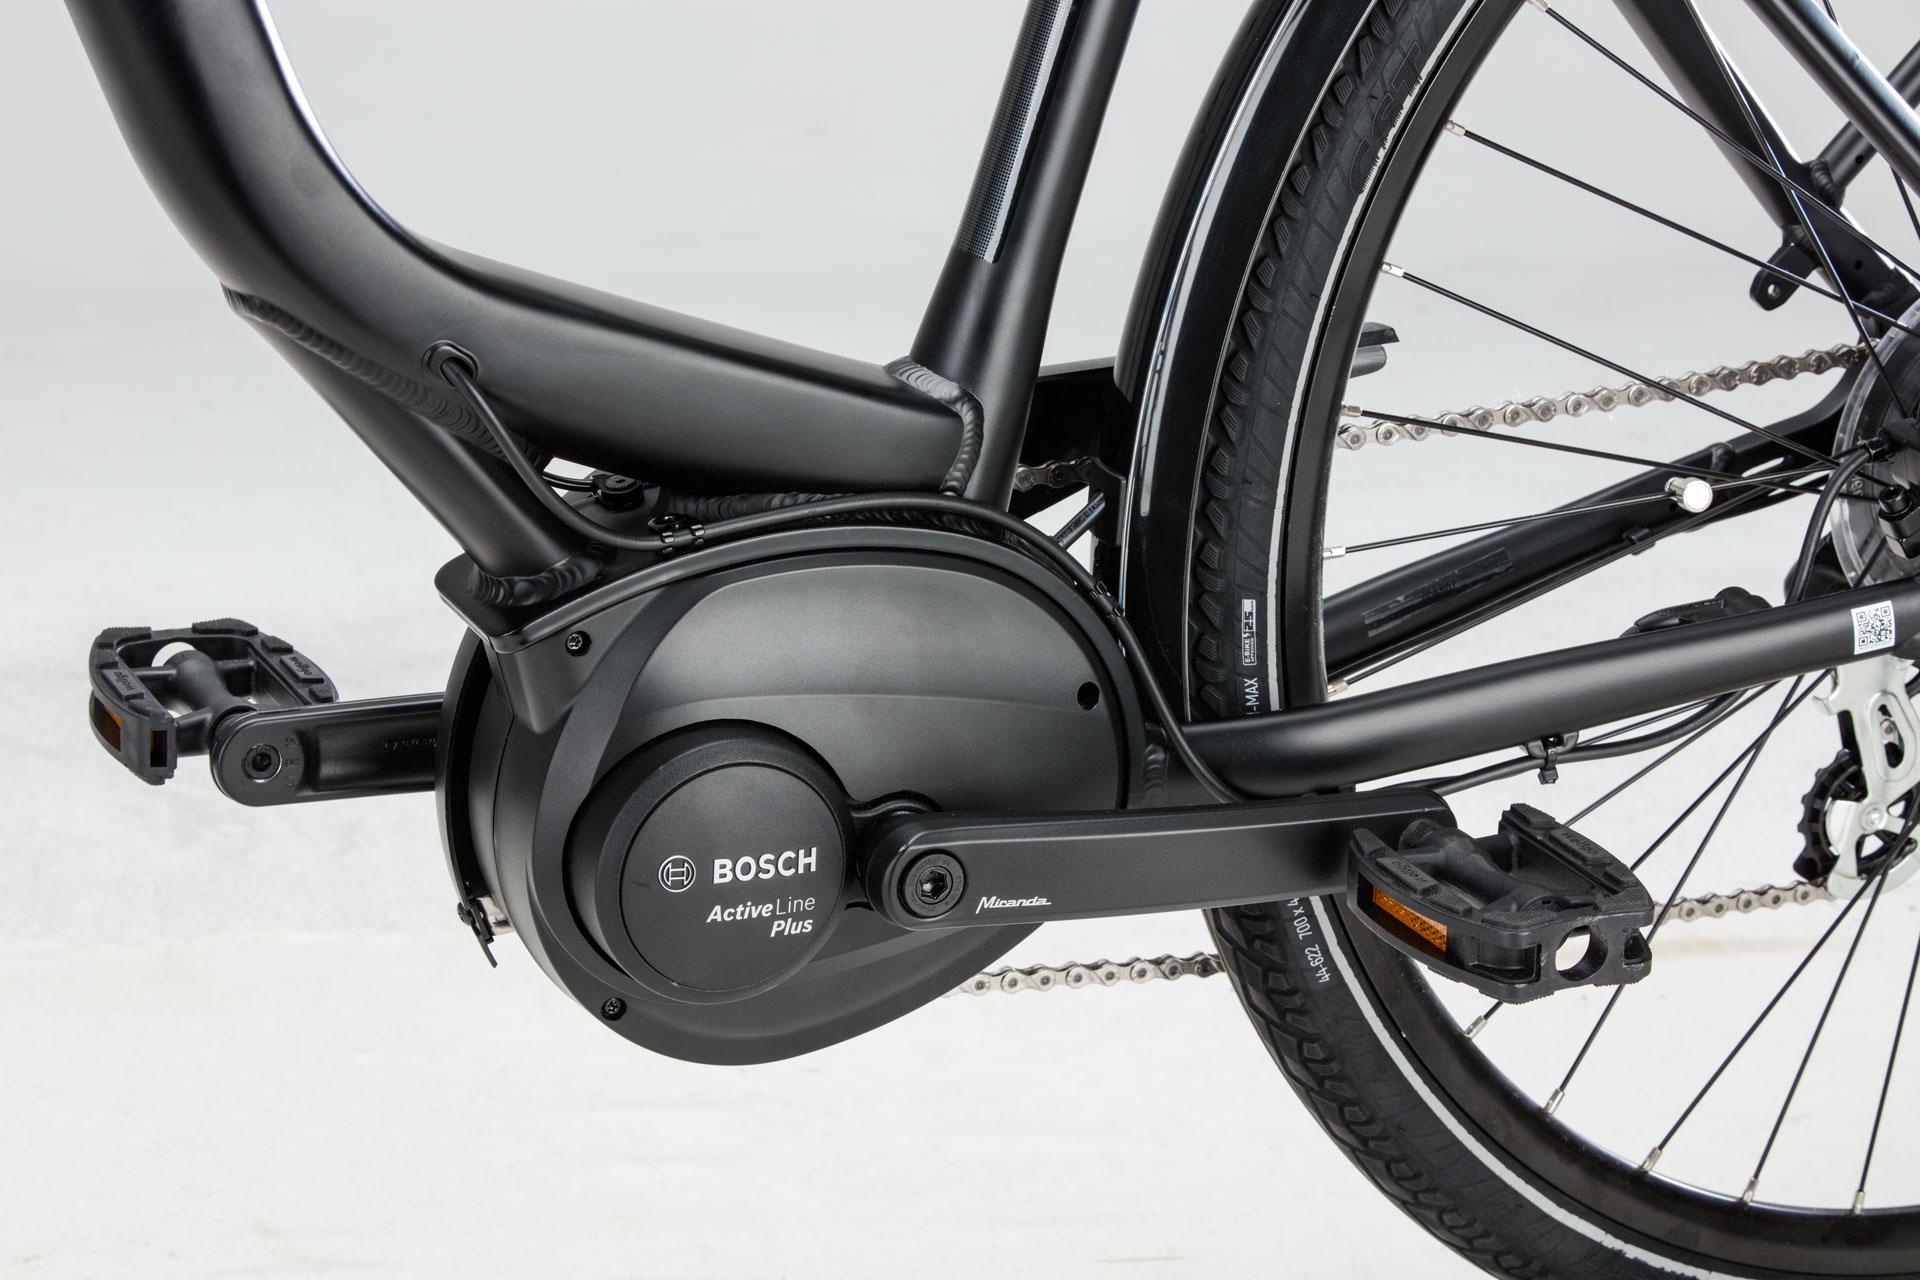 Bosch Performance Line Motor